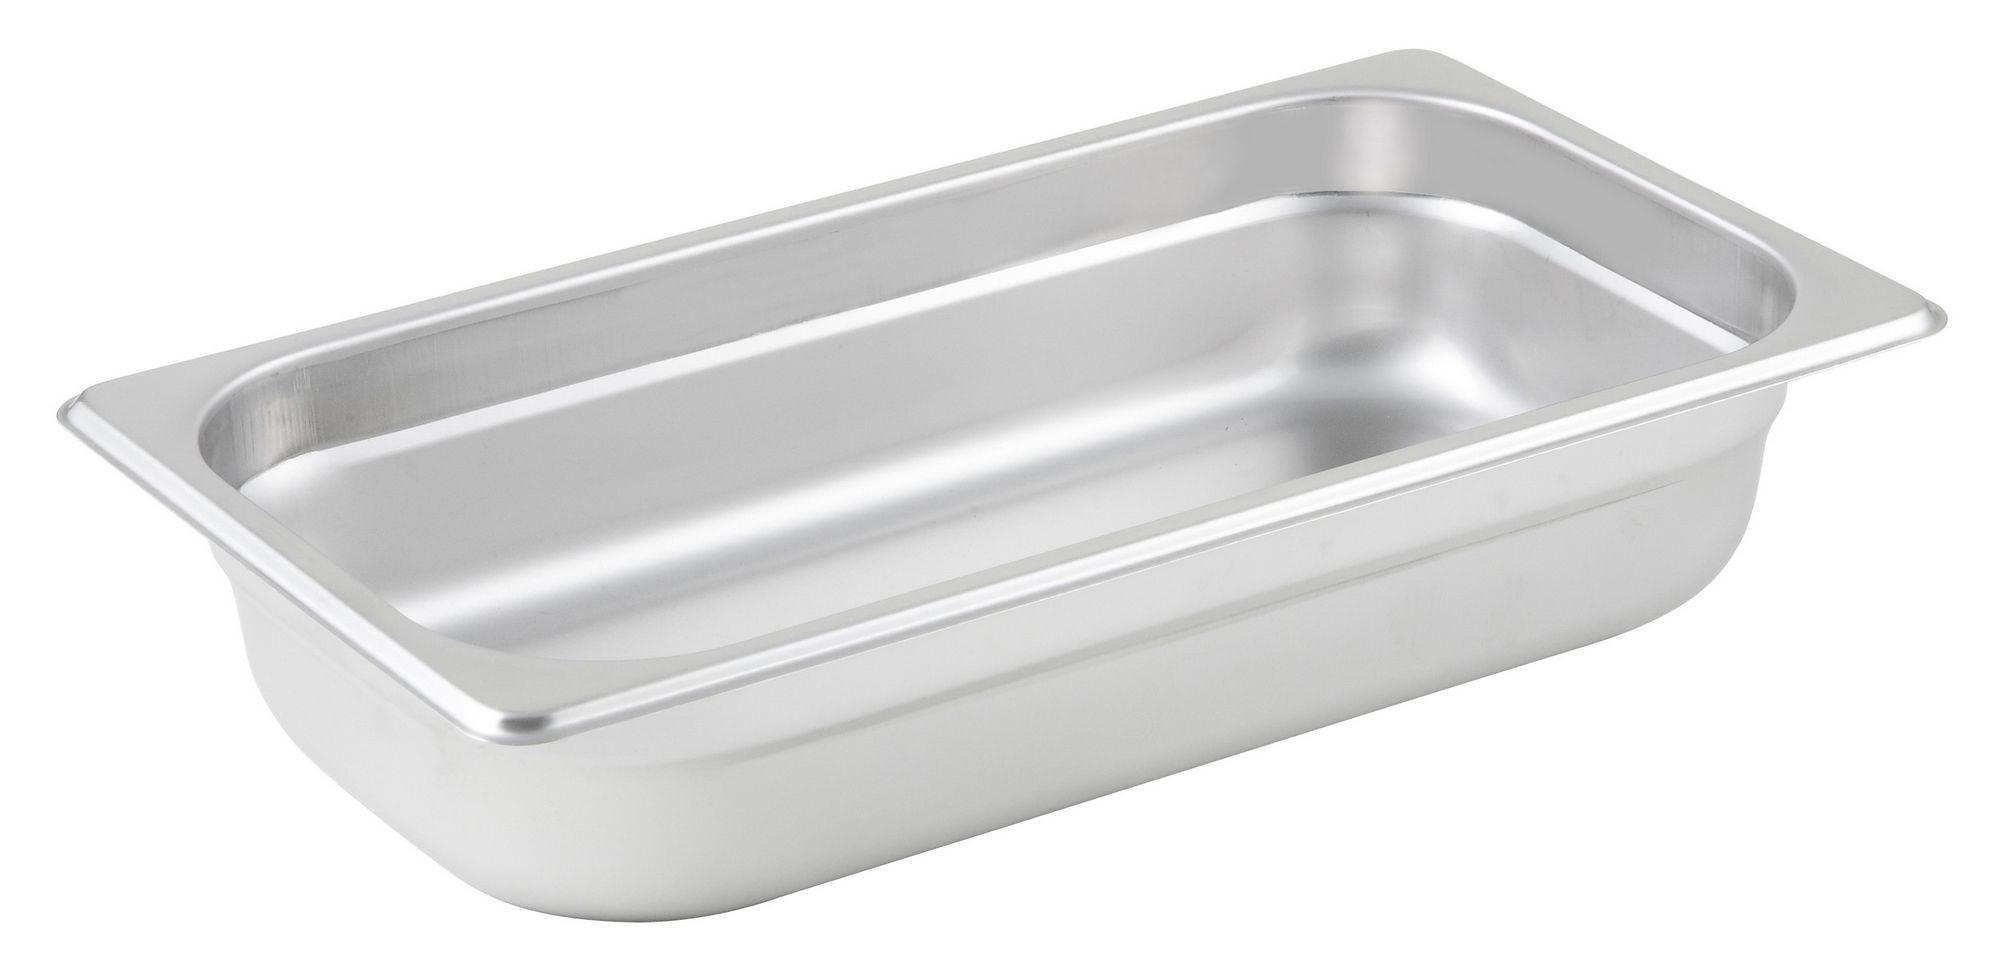 "Winco SPJL-302 1/3 Size Anti-Jam 25 Gauge Steam Table Pan 2-1/2"" Deep"